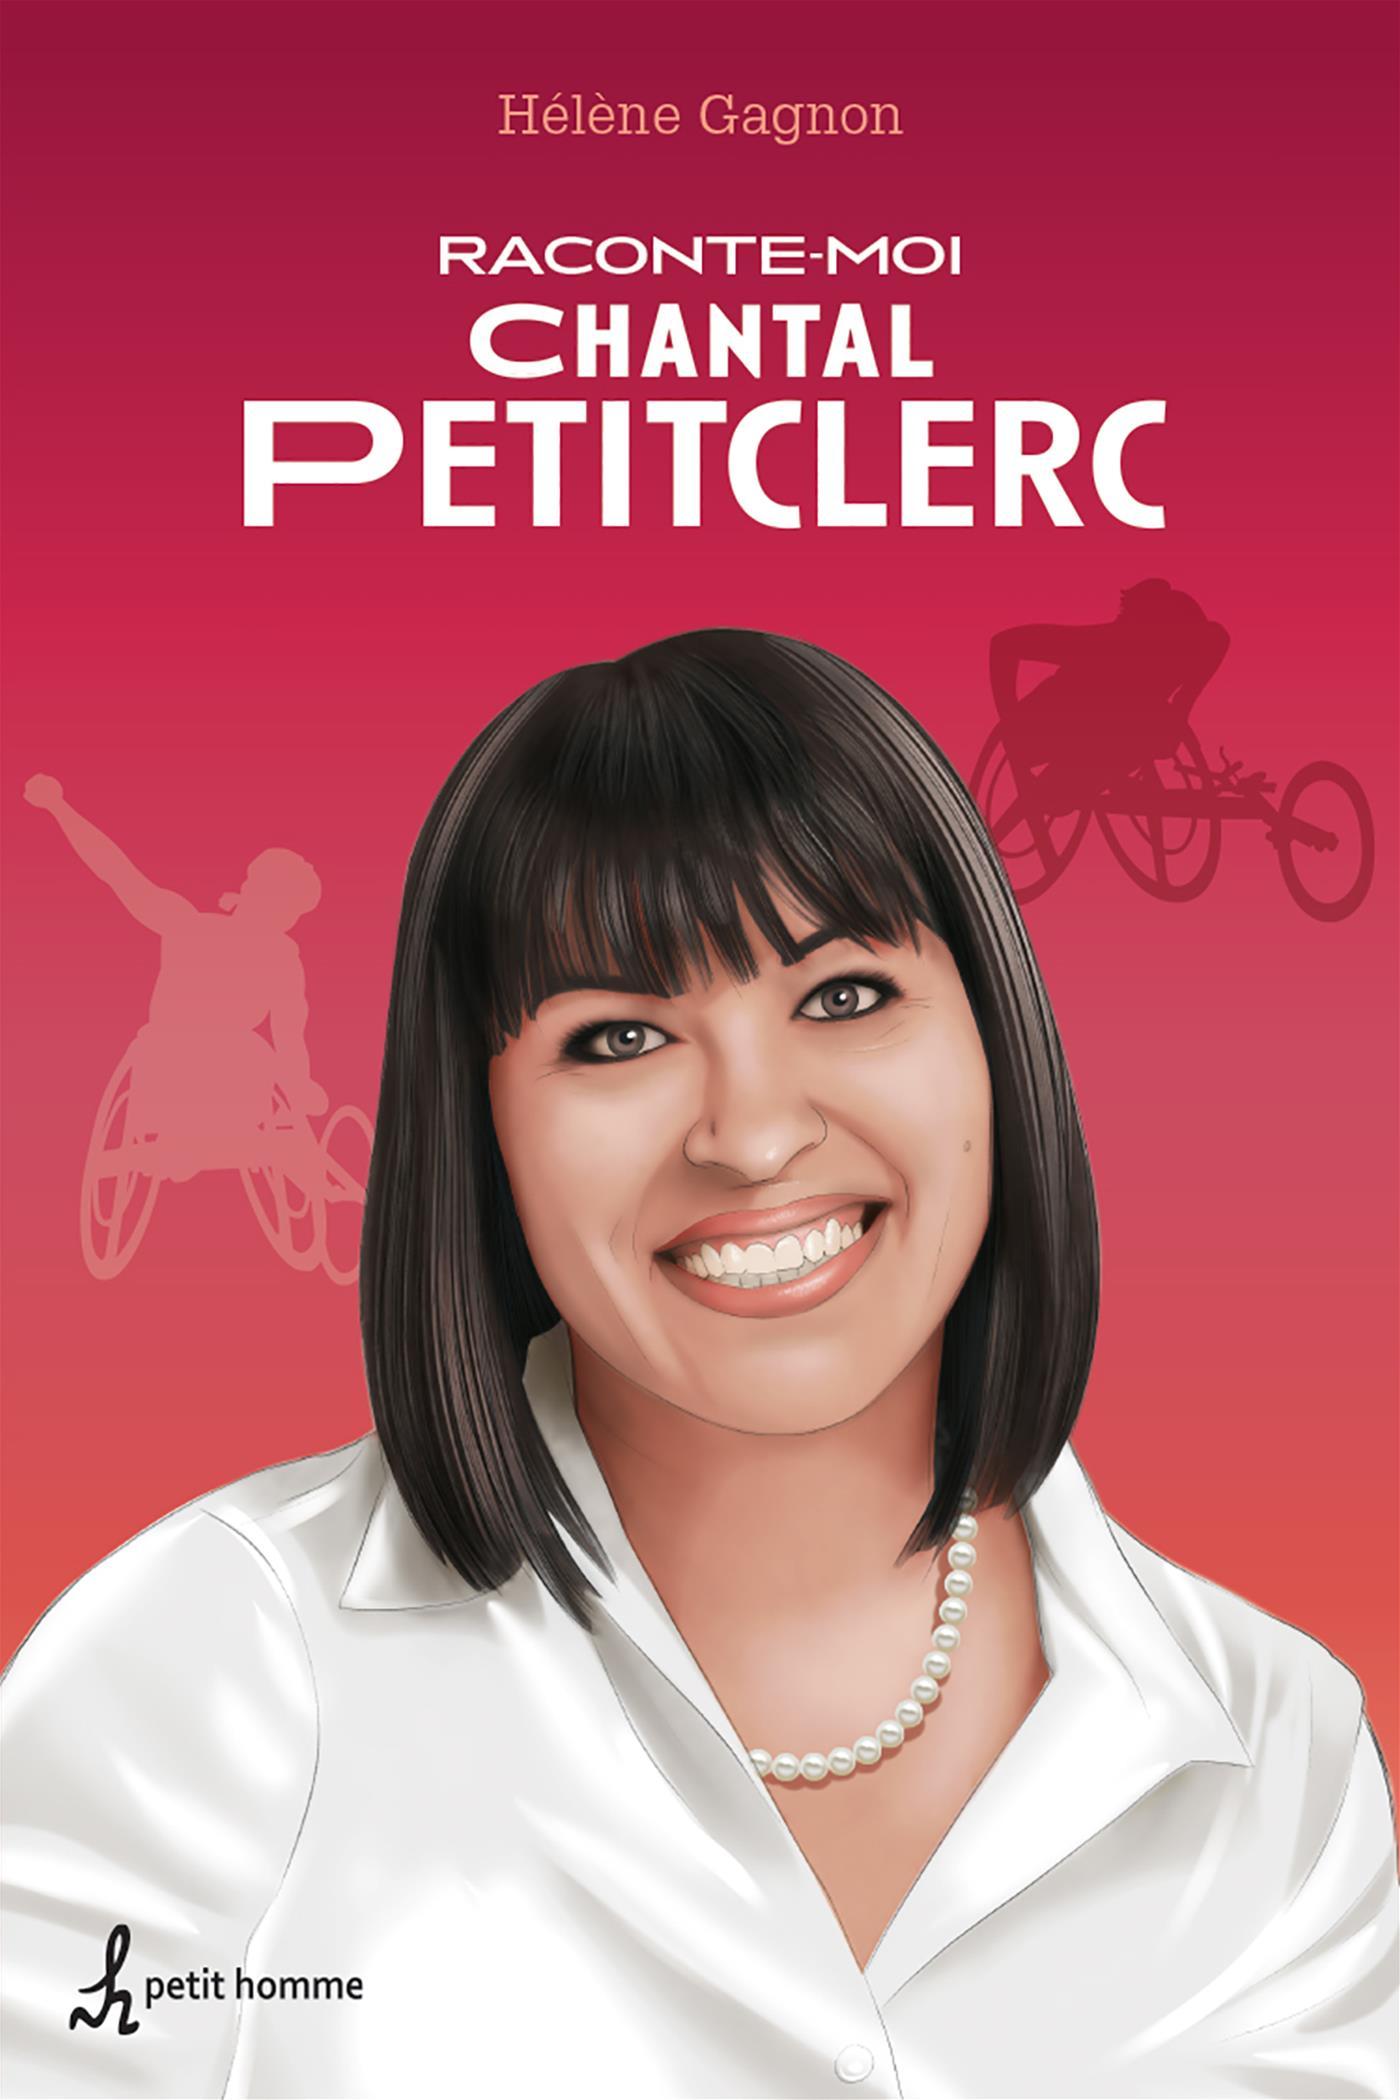 Raconte-moi Chantal Petitclerc